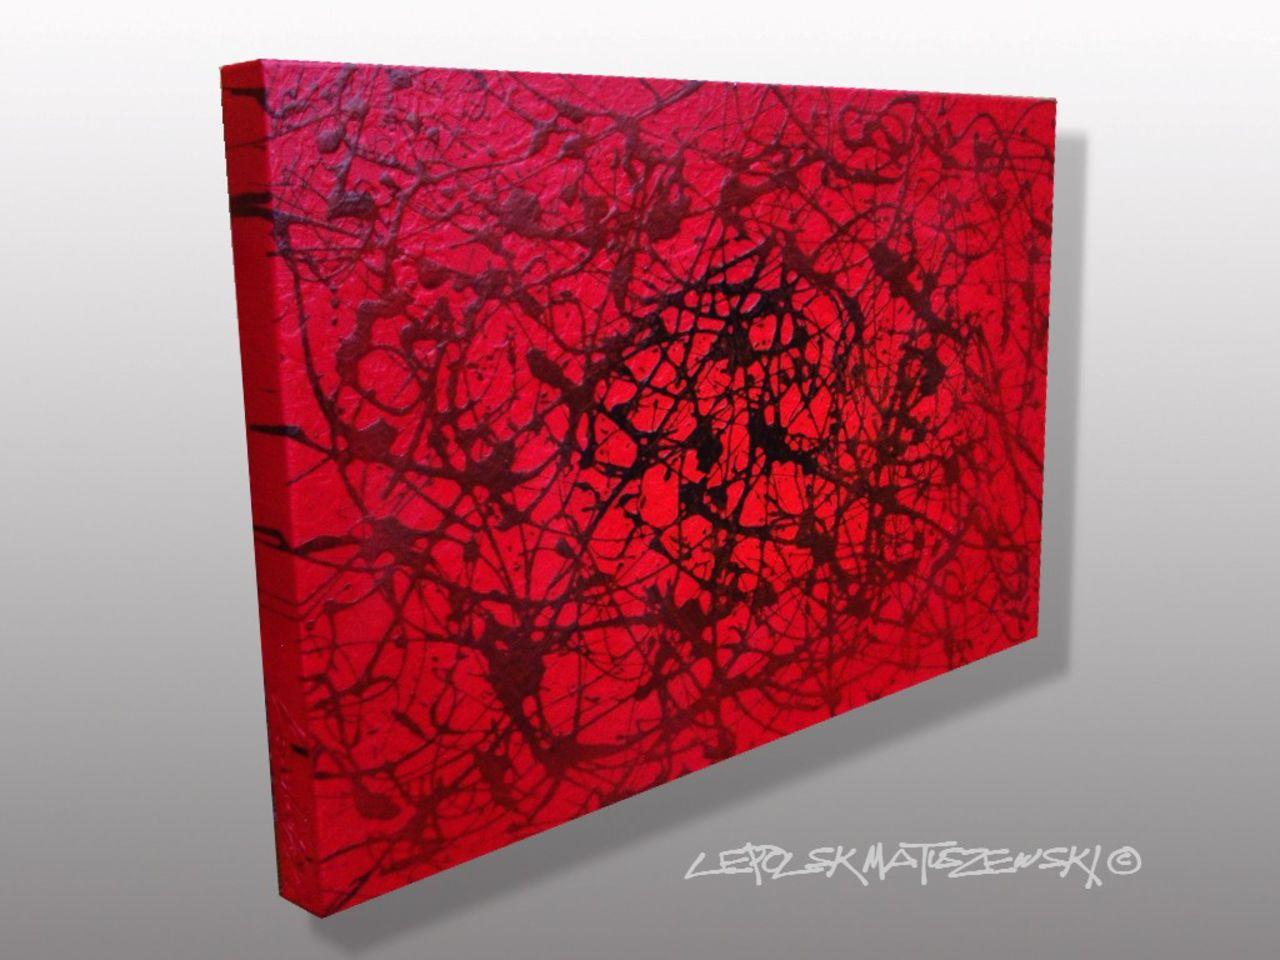 LEPOLSK MATUSZEWSKI FLOW  Expressionnisme abstrait contemporain